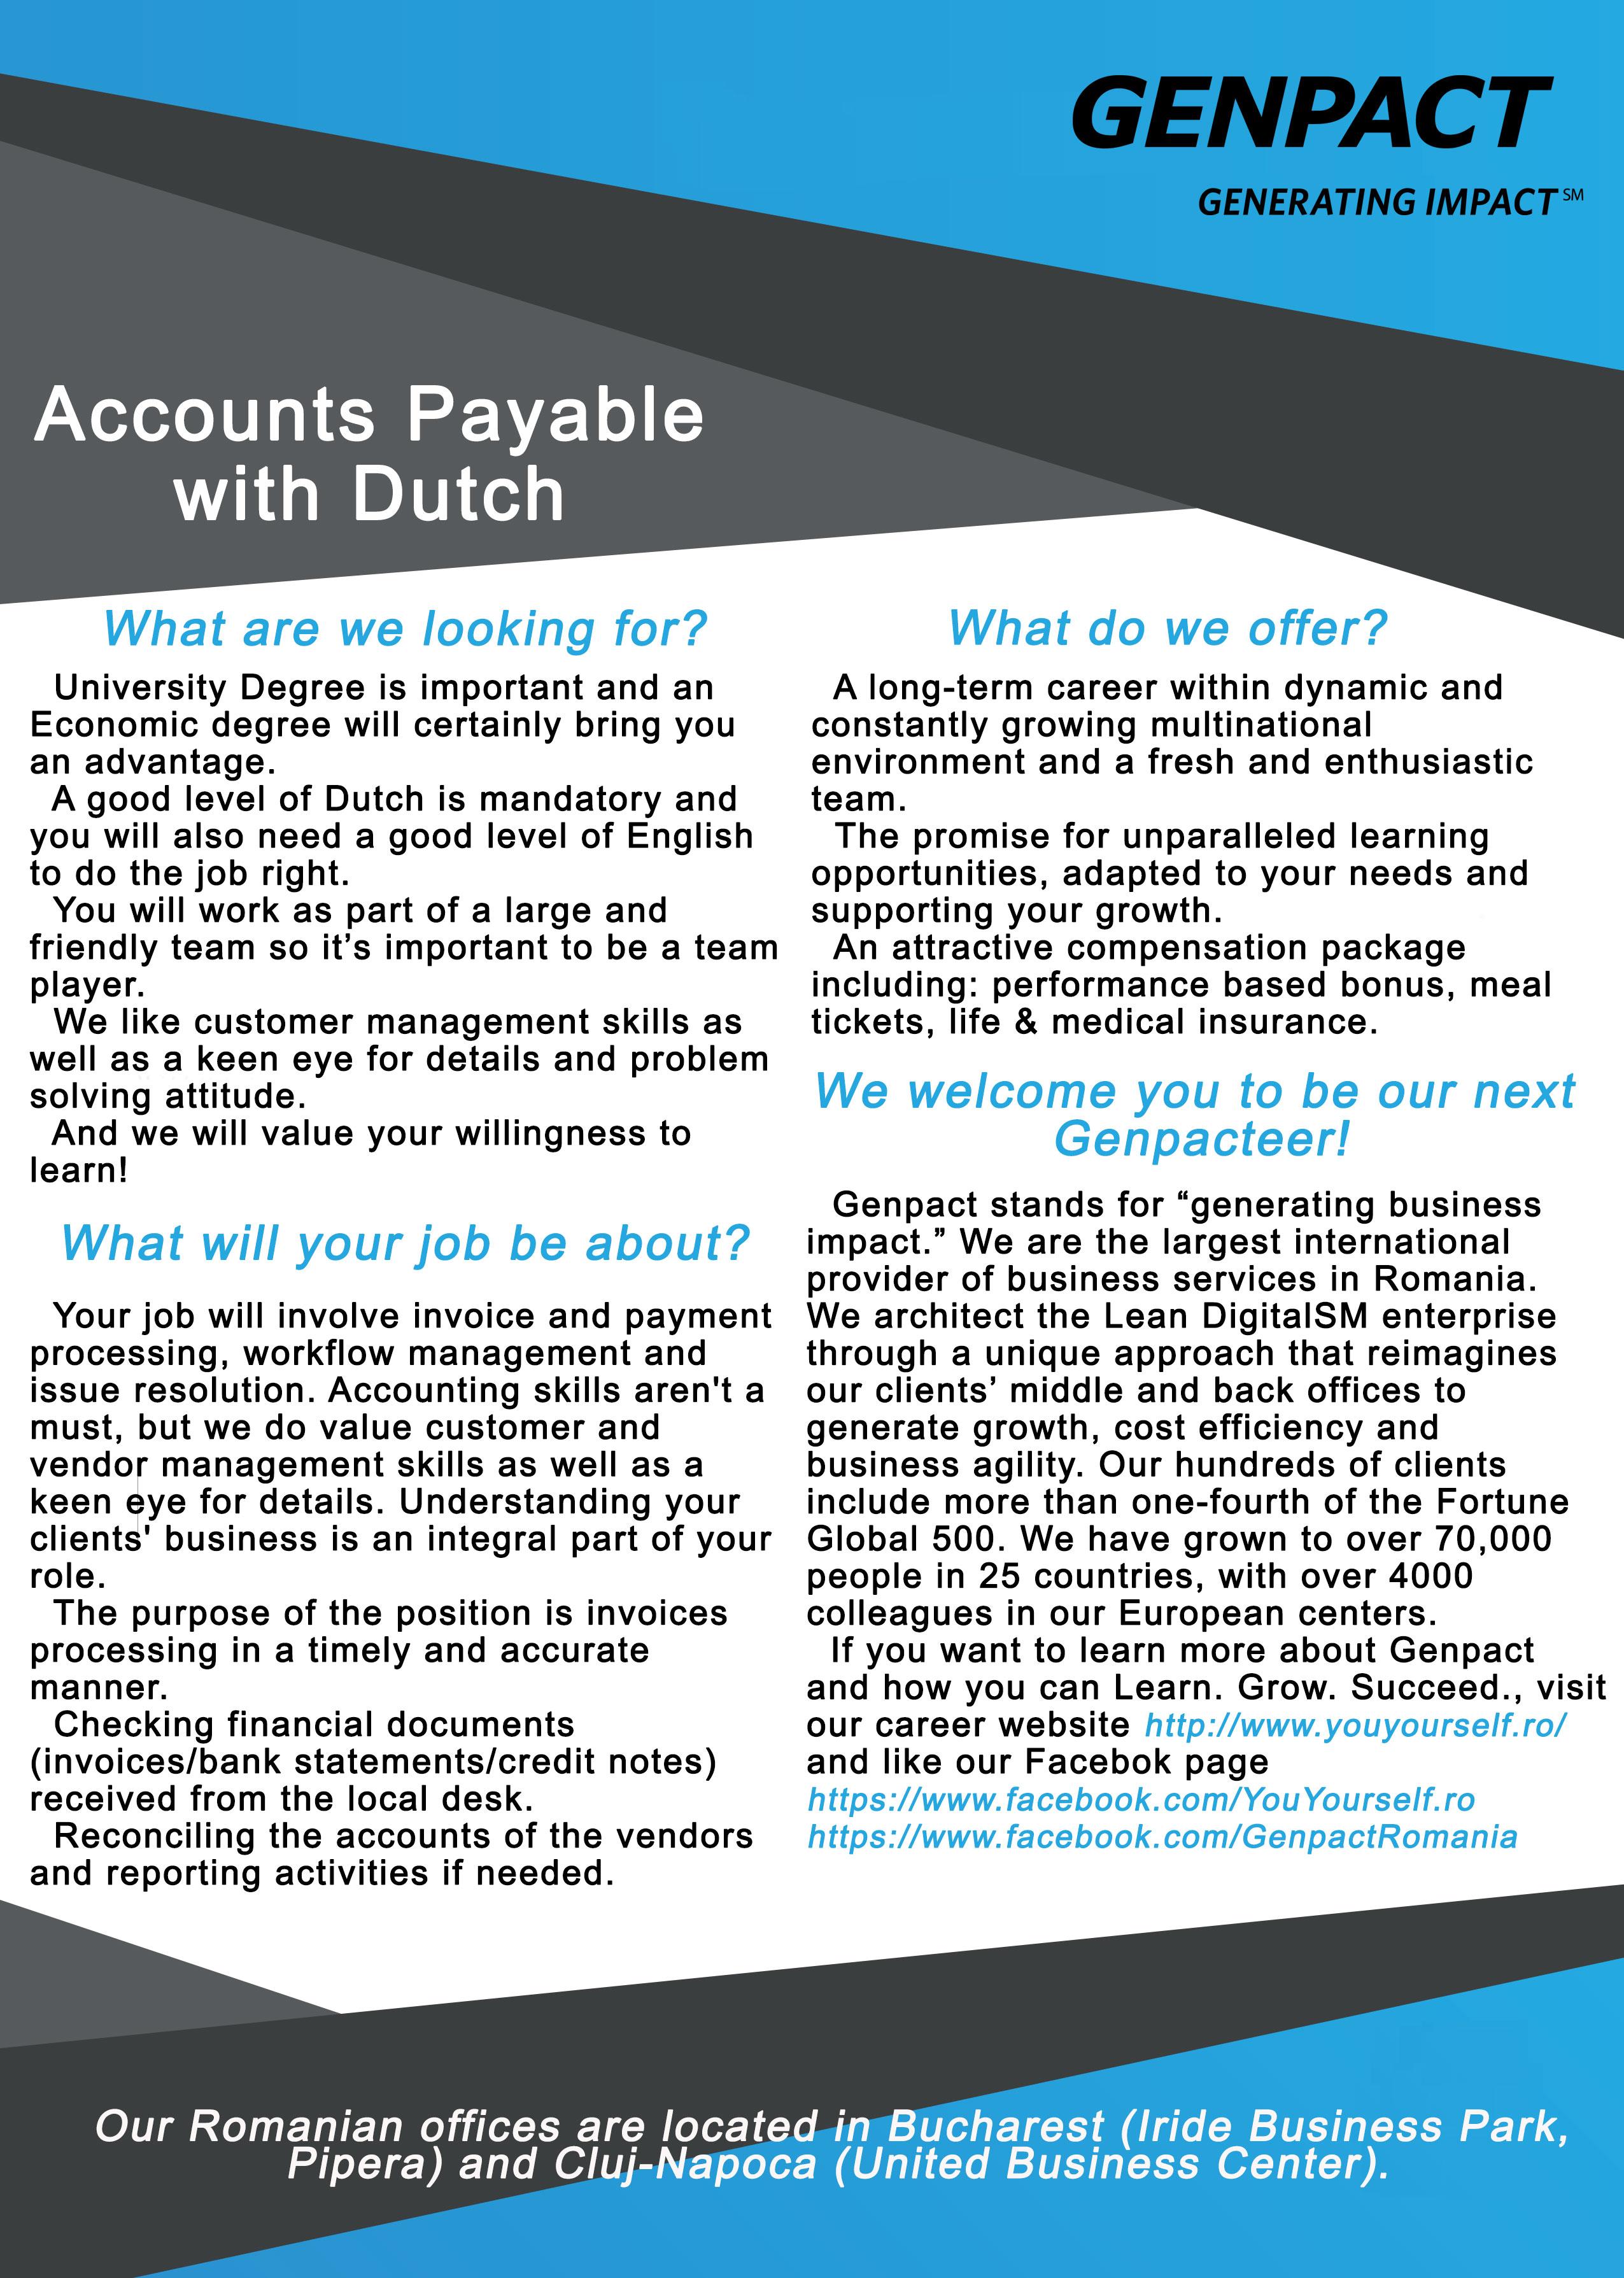 Accounts Payable with Dutch